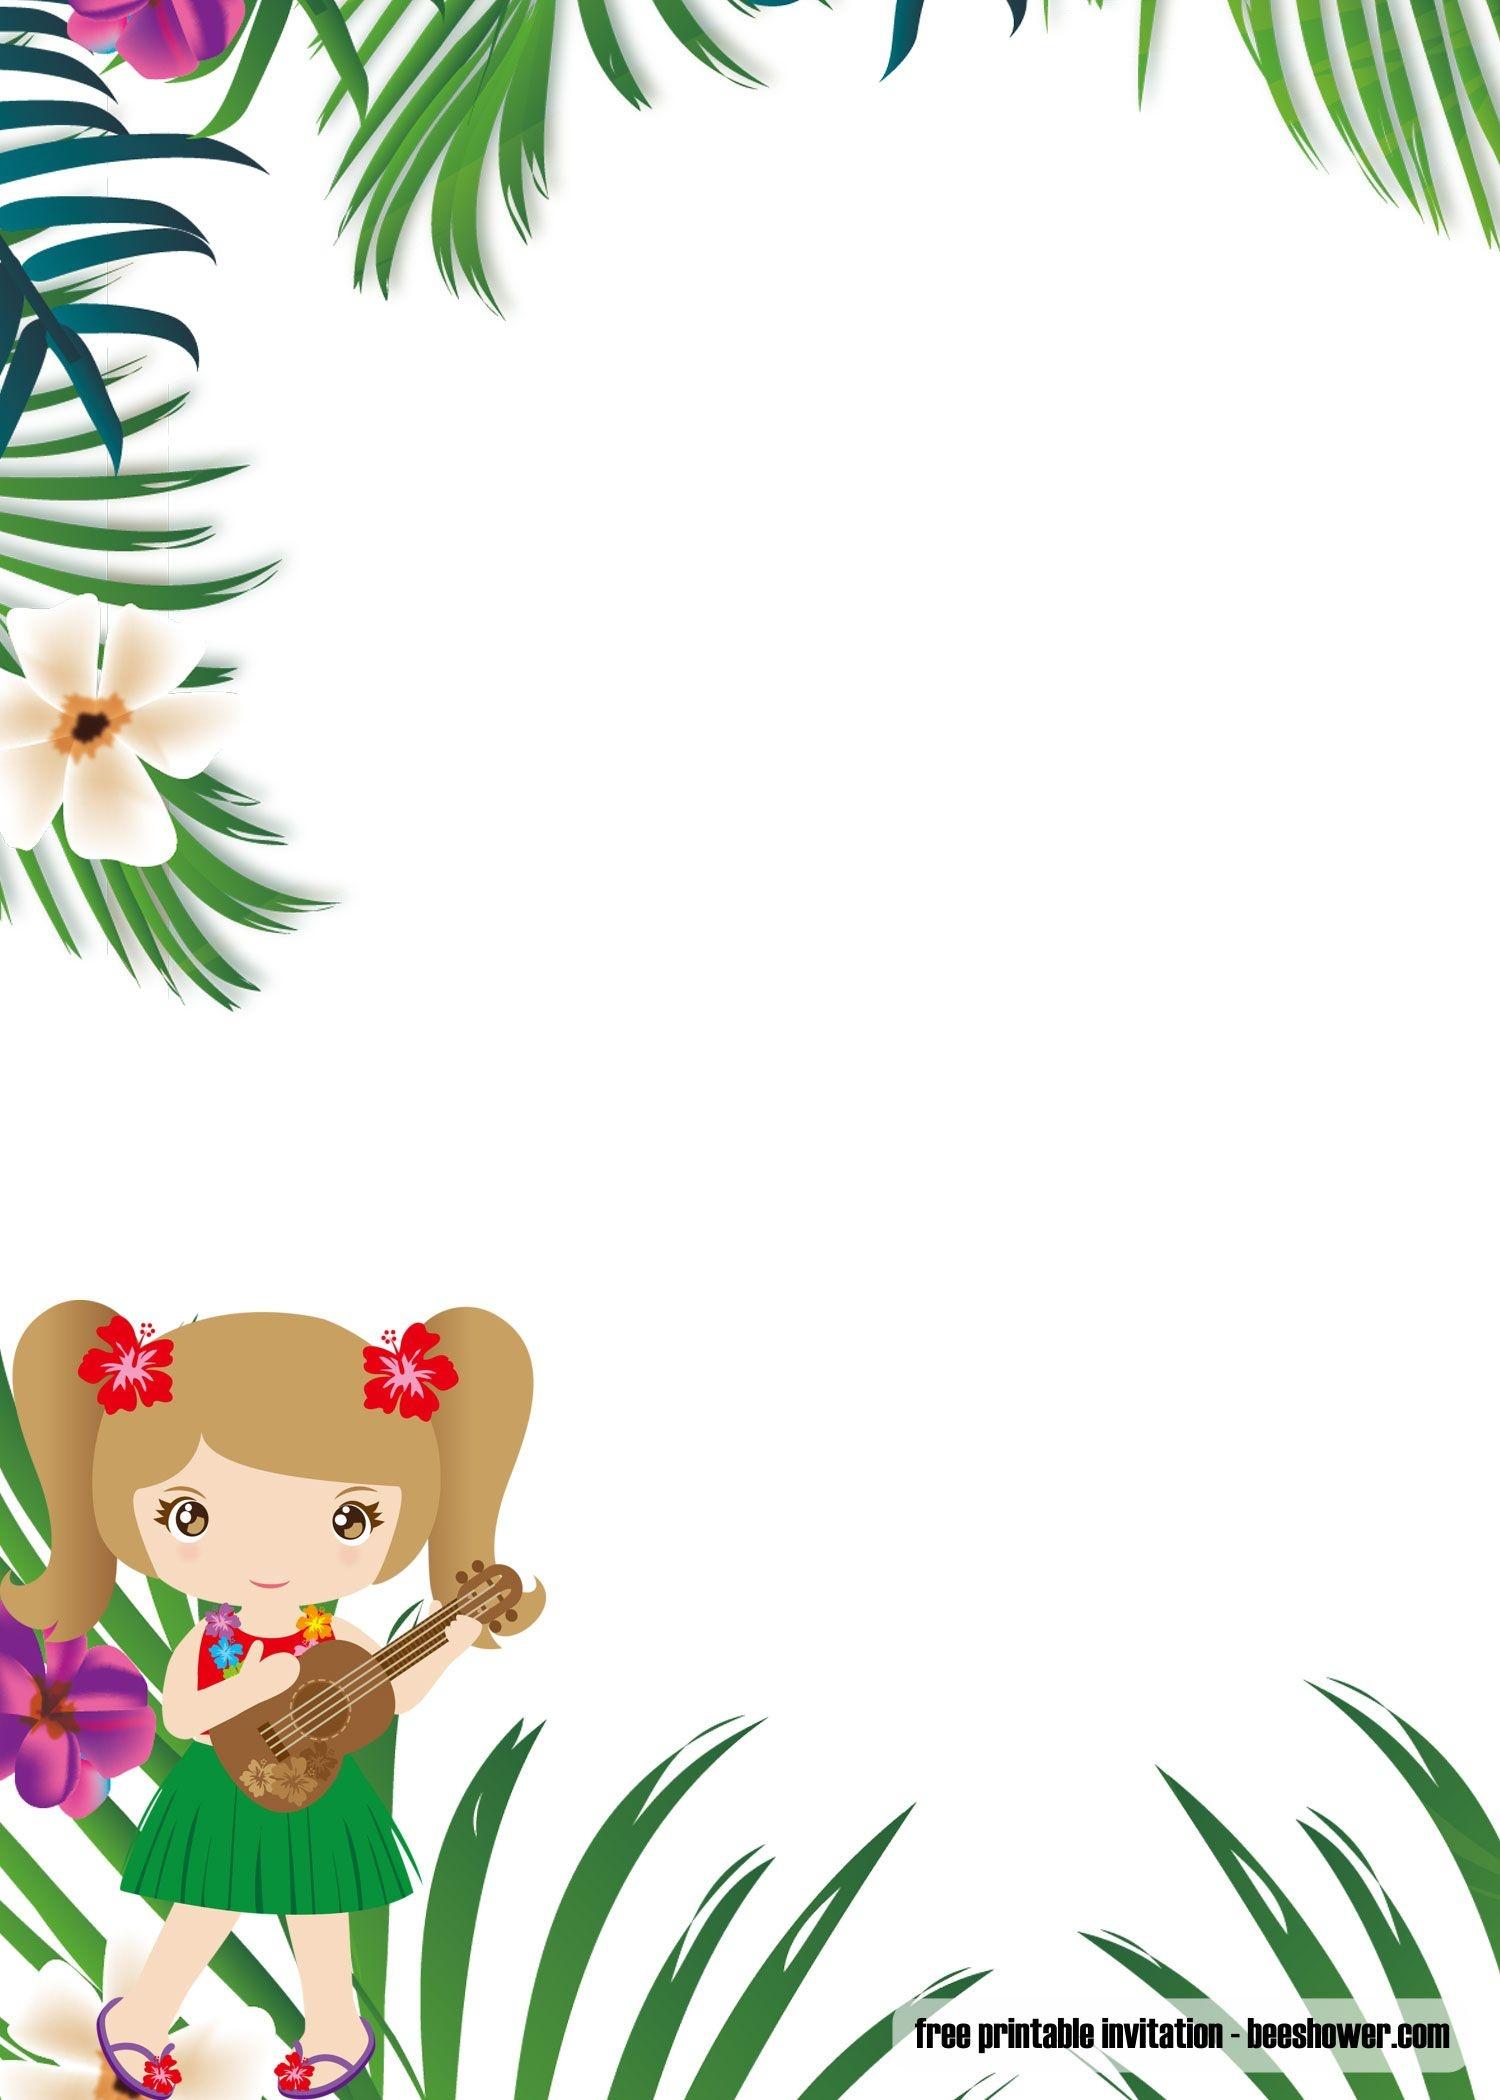 Cool Free Luau Baby Shower Invitations Templates | Beeshower | Baby - Free Printable Luau Baby Shower Invitations